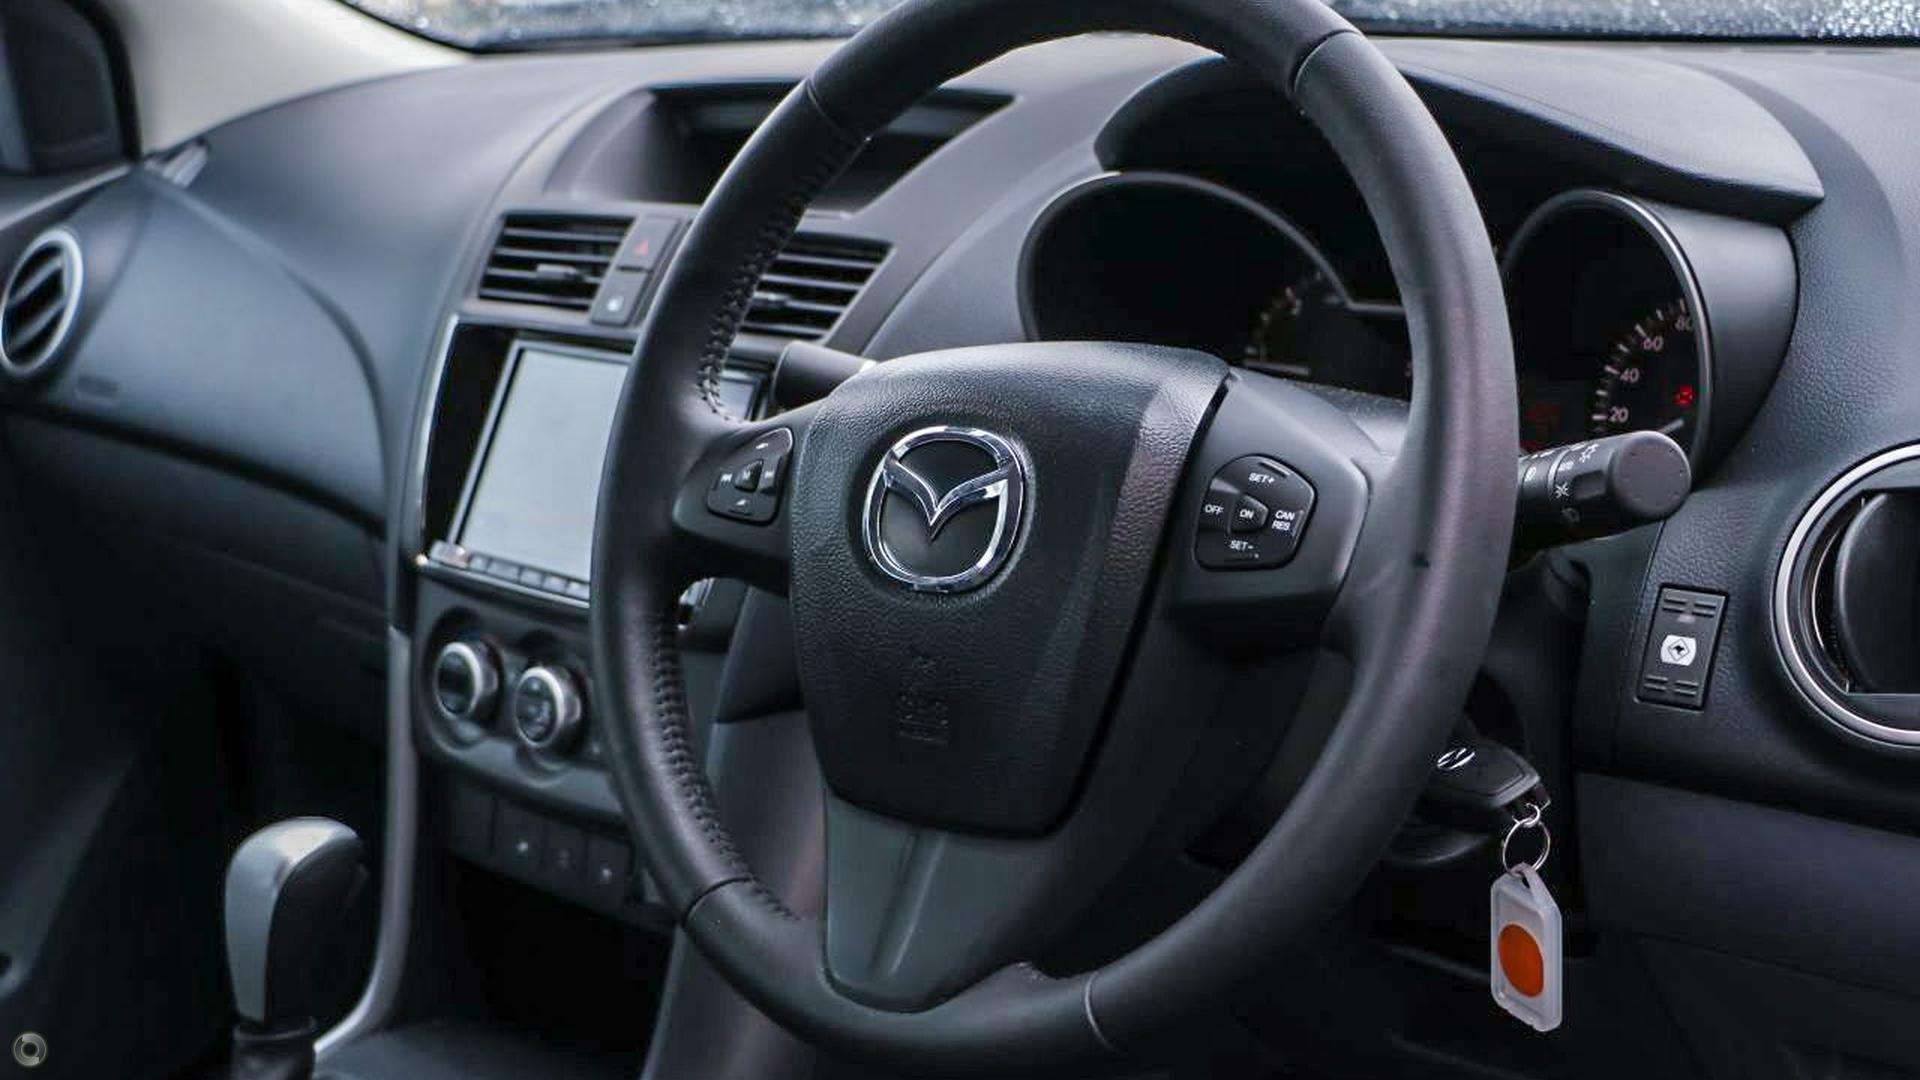 2018 Mazda Bt-50 XTR UR